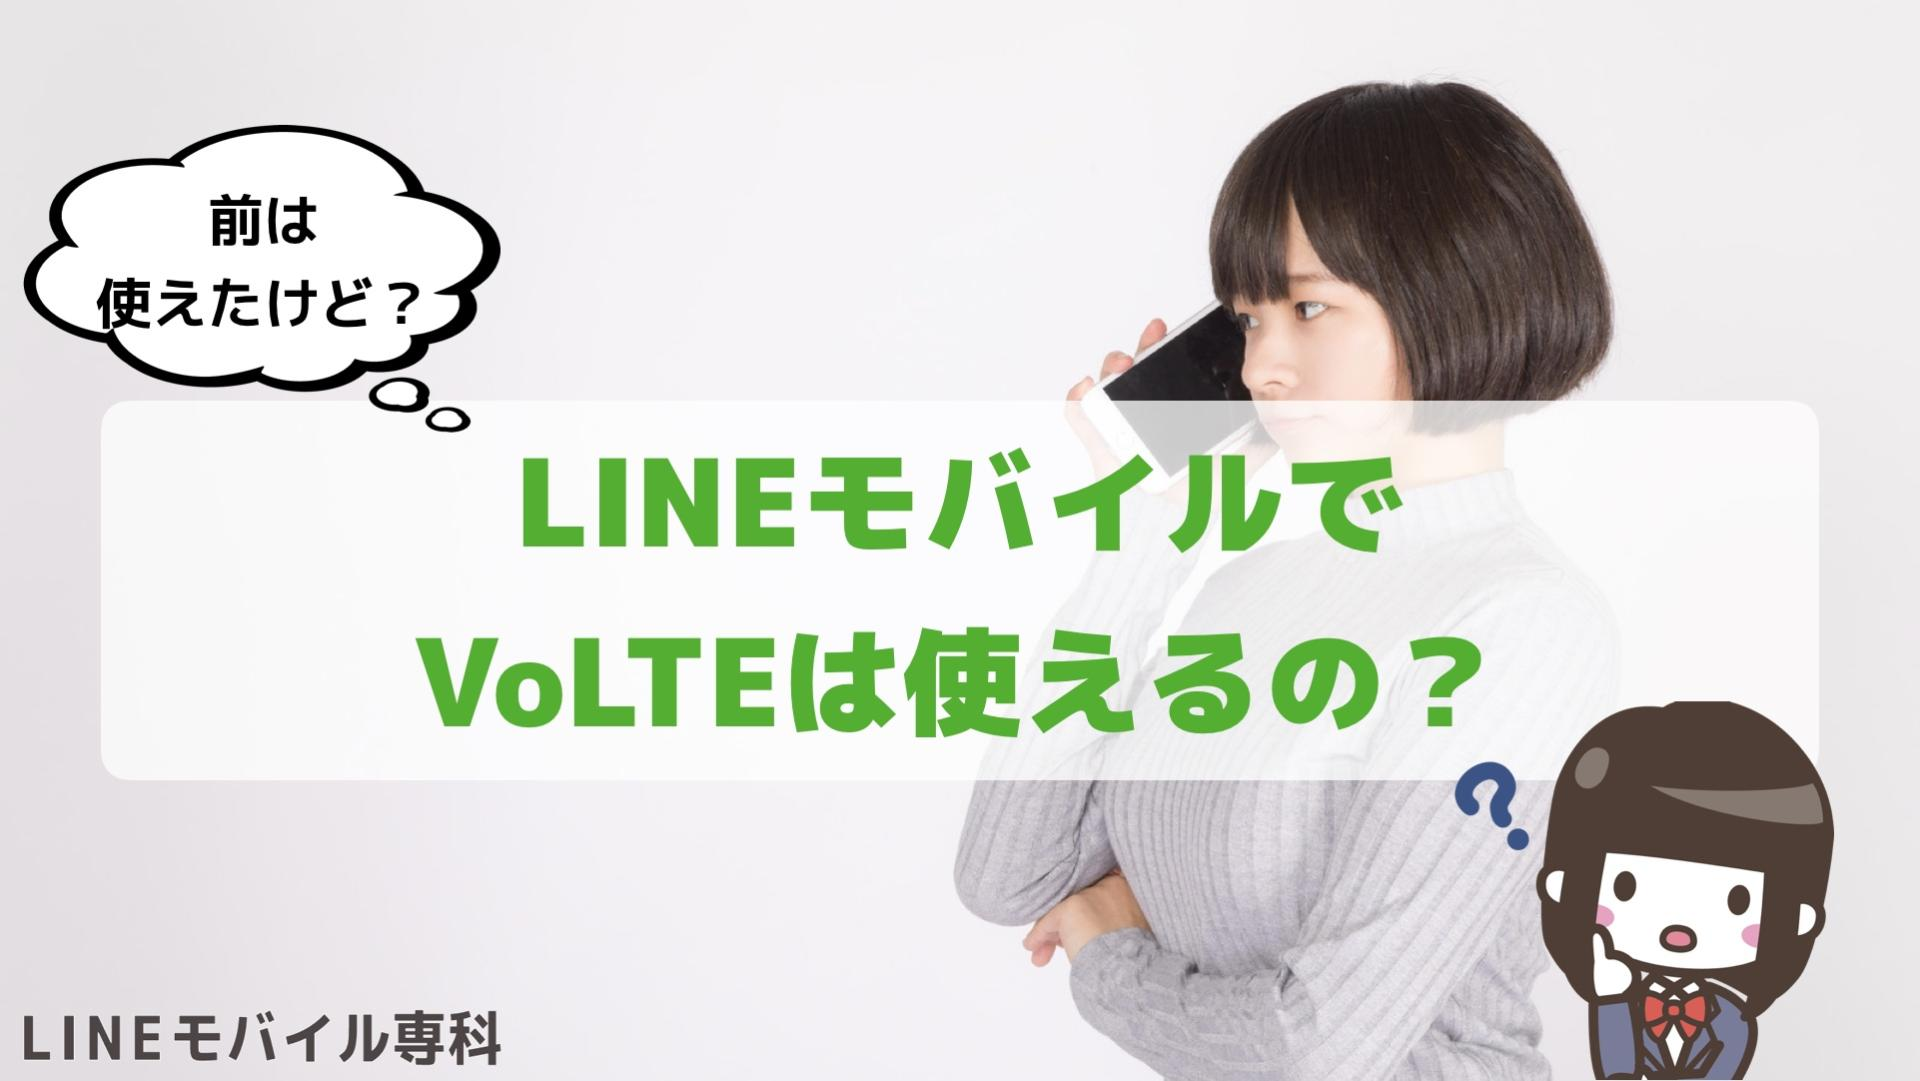 LINEモバイルでVoLTEは使える?